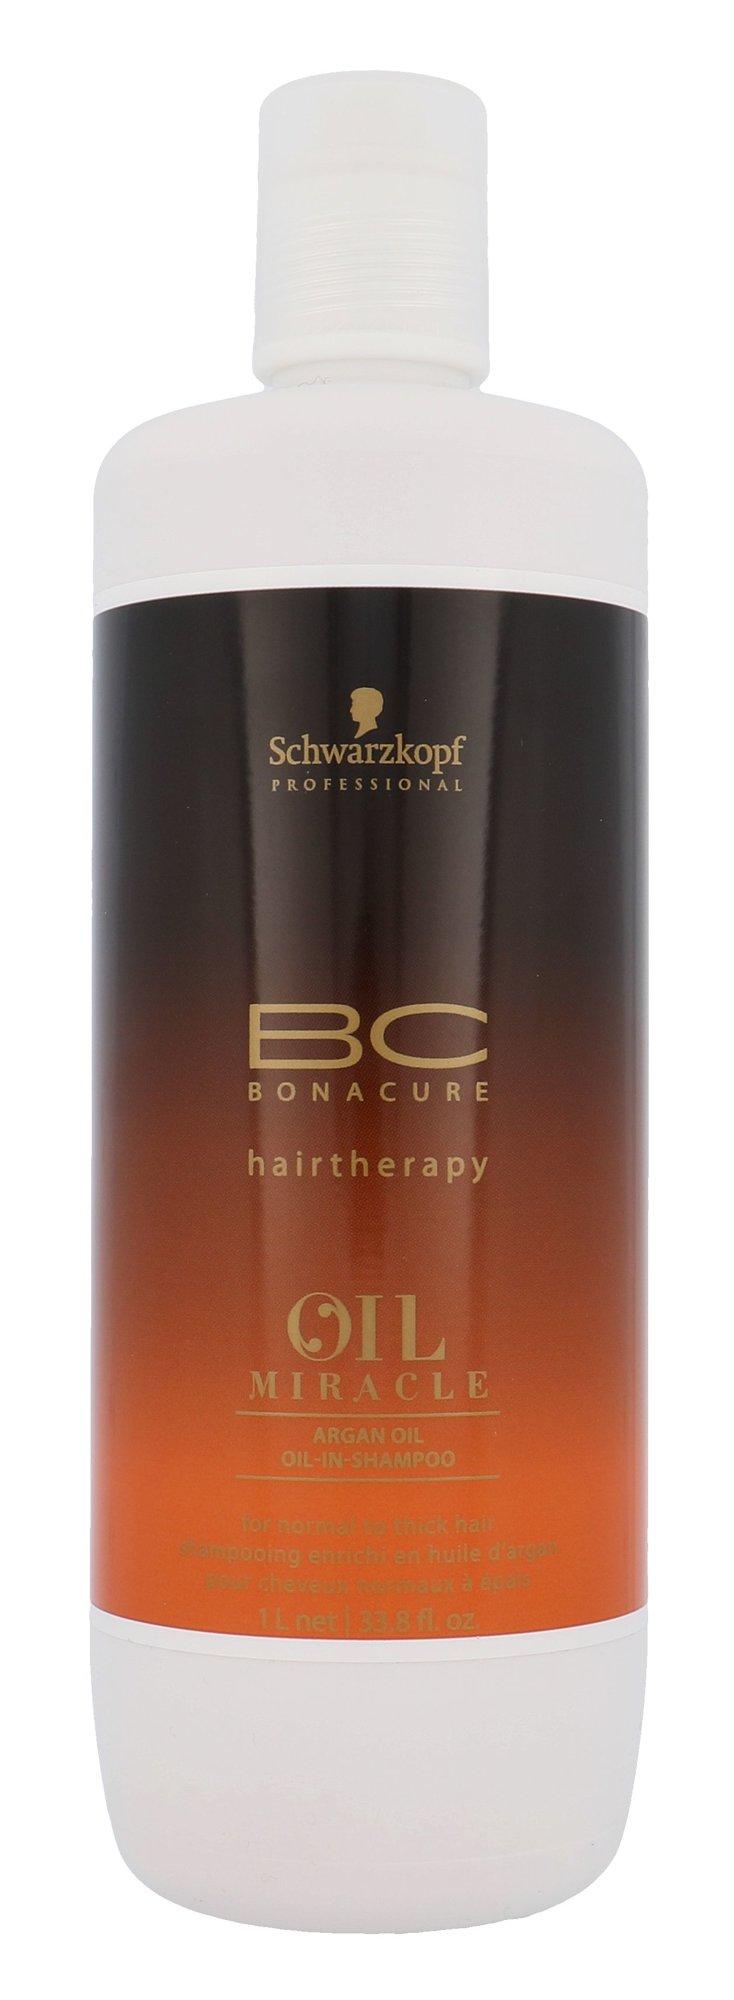 Schwarzkopf BC Bonacure Oil Miracle Shampoo 1000ml